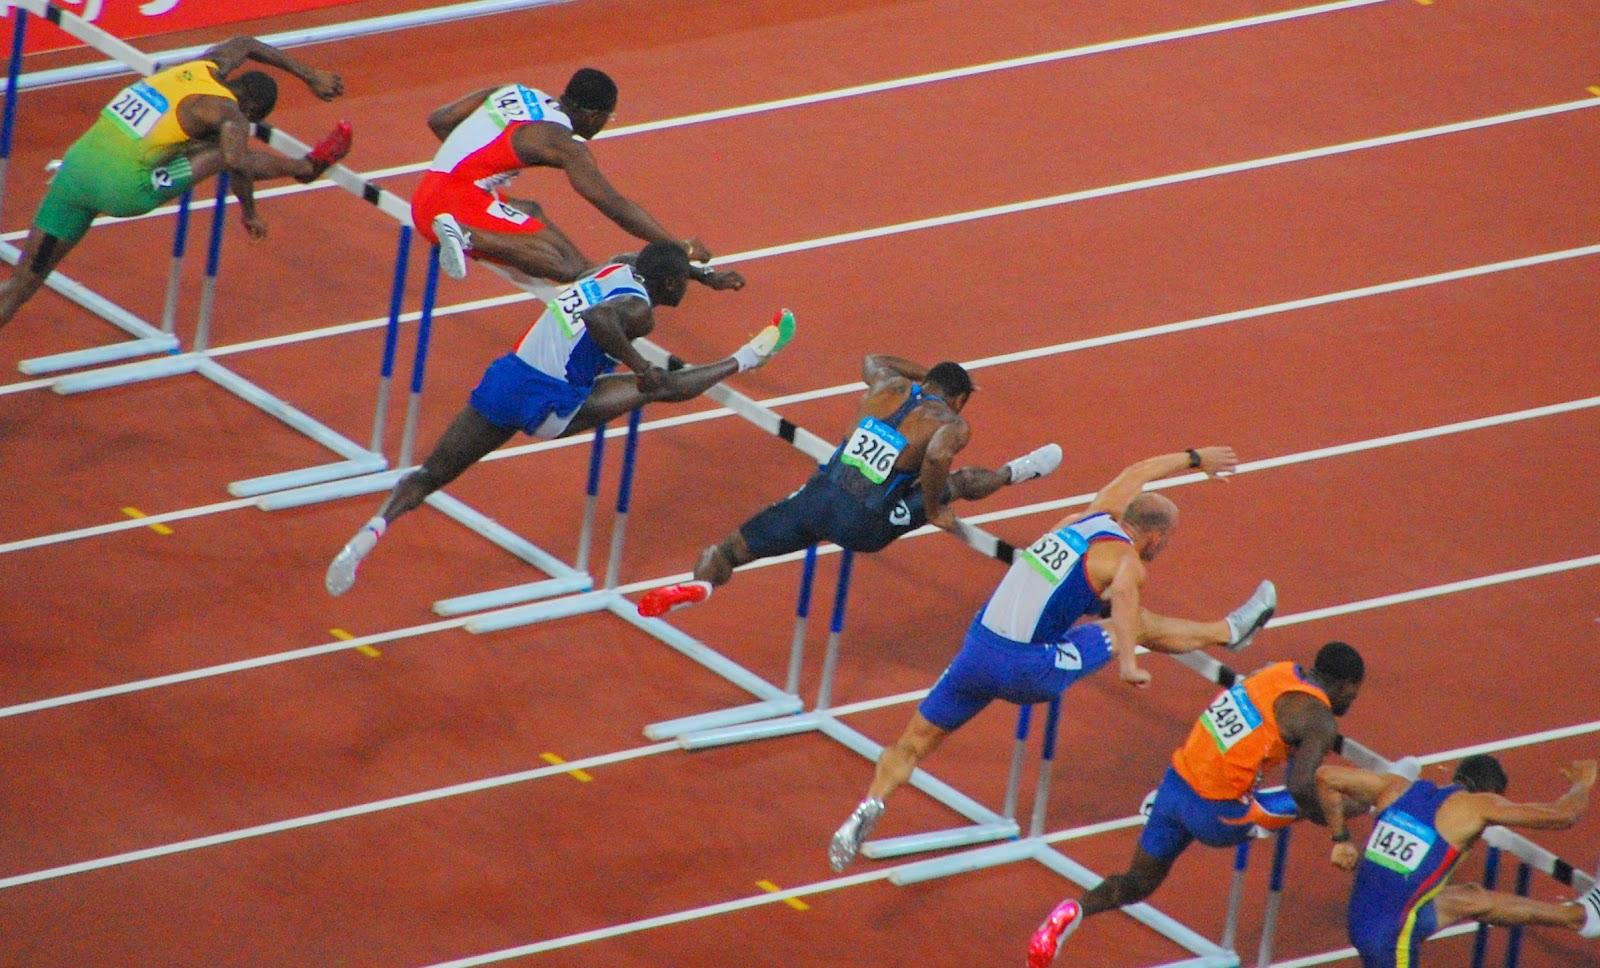 2008_Summer_Olympics_-_Men's_110m_Hurdles_-_Semifinal_1.jpg